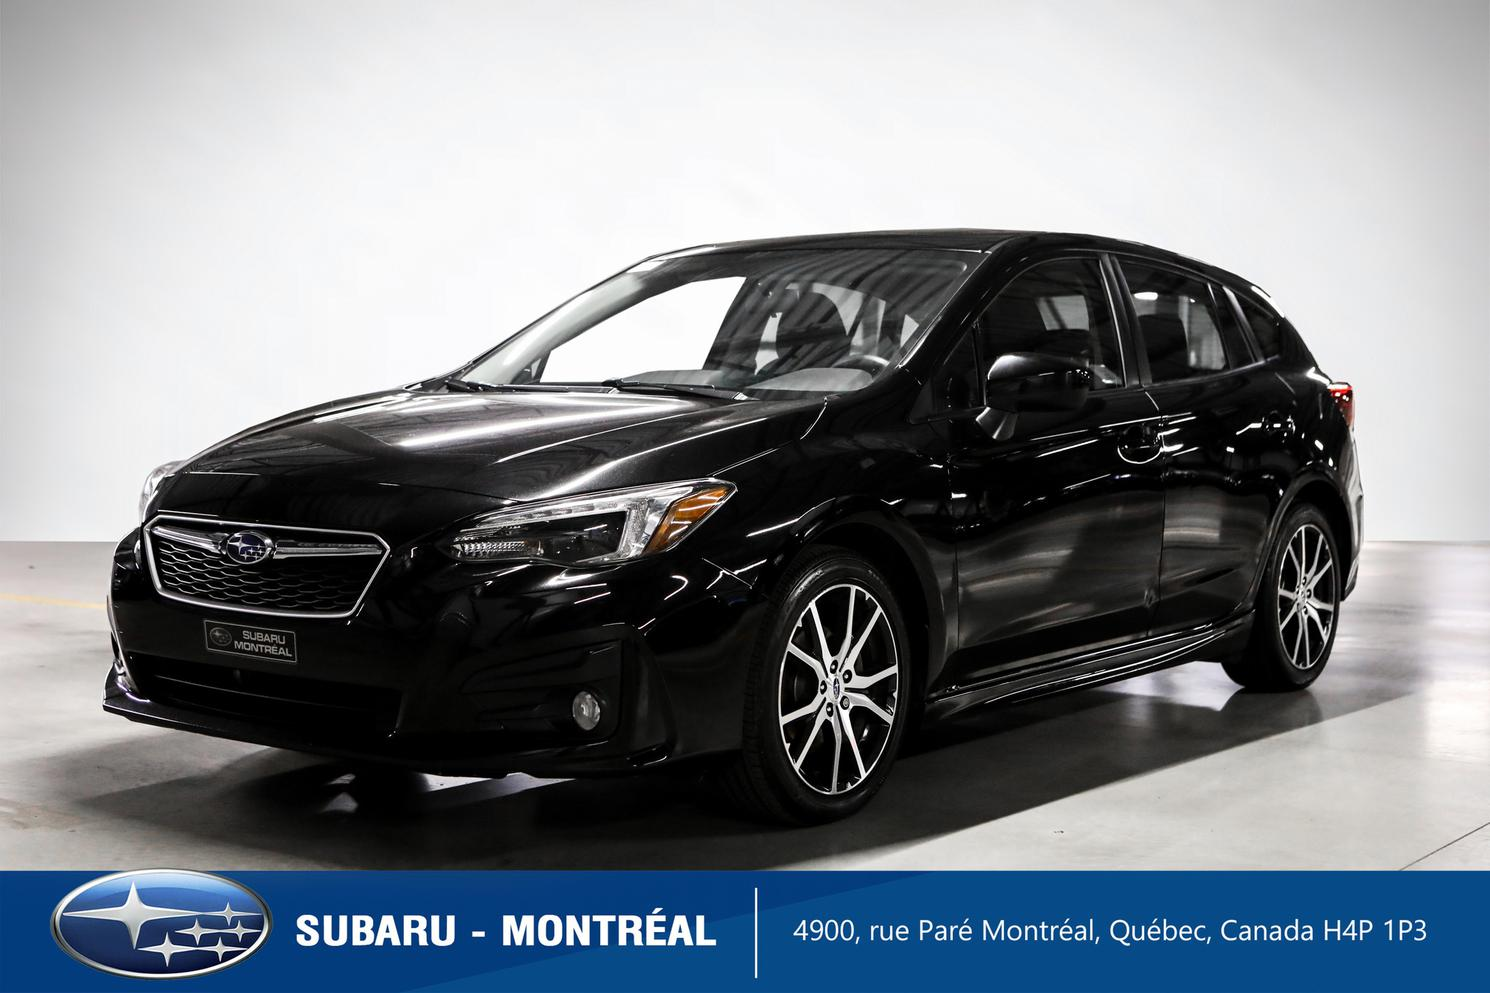 2019 Subaru Impreza Sport Hatchback